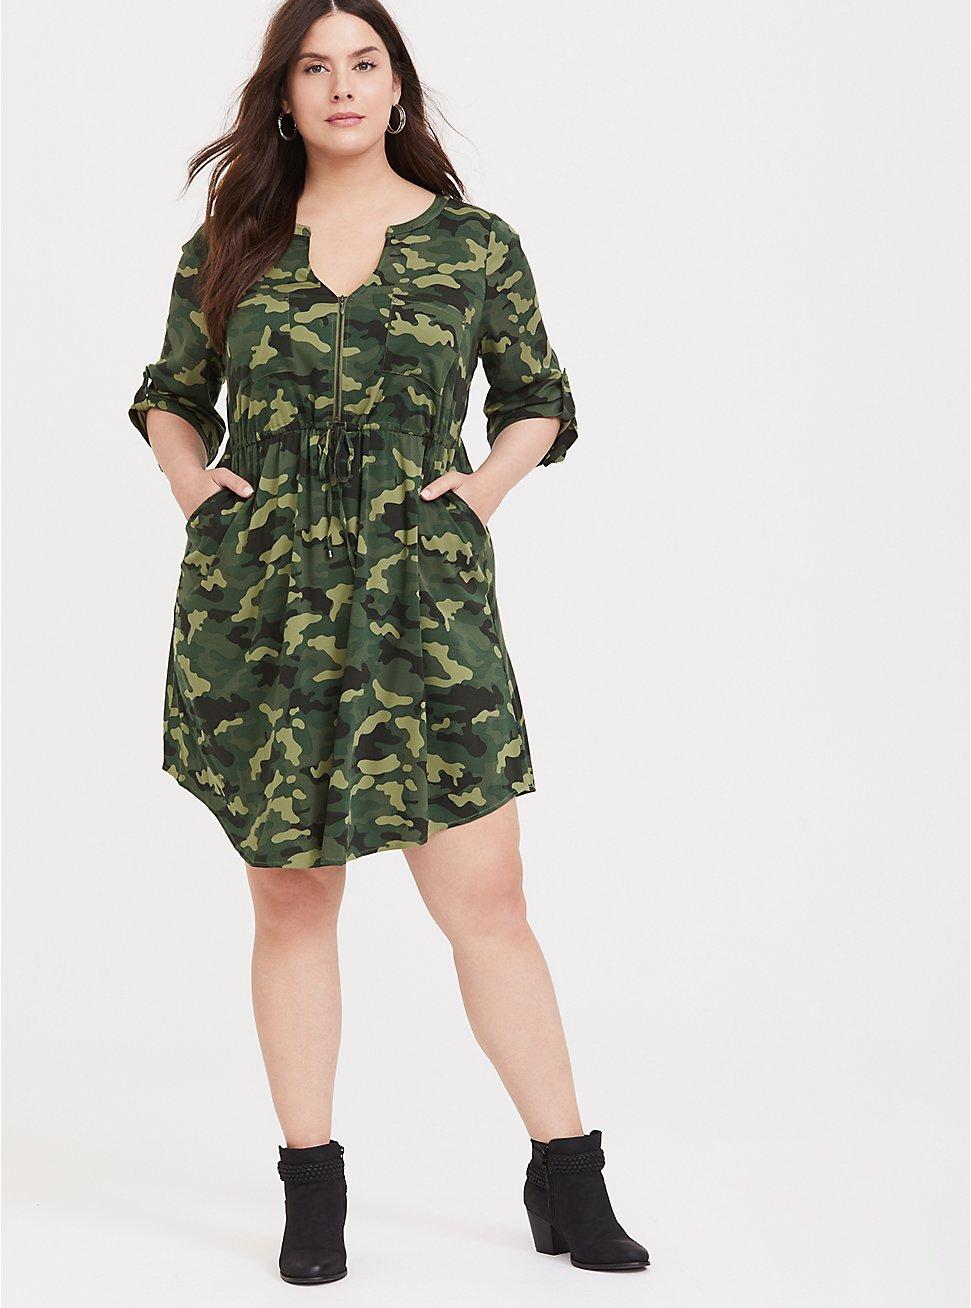 Camo Challis Zip Front Shirt Dress, CAMO-GREEN, hi-res